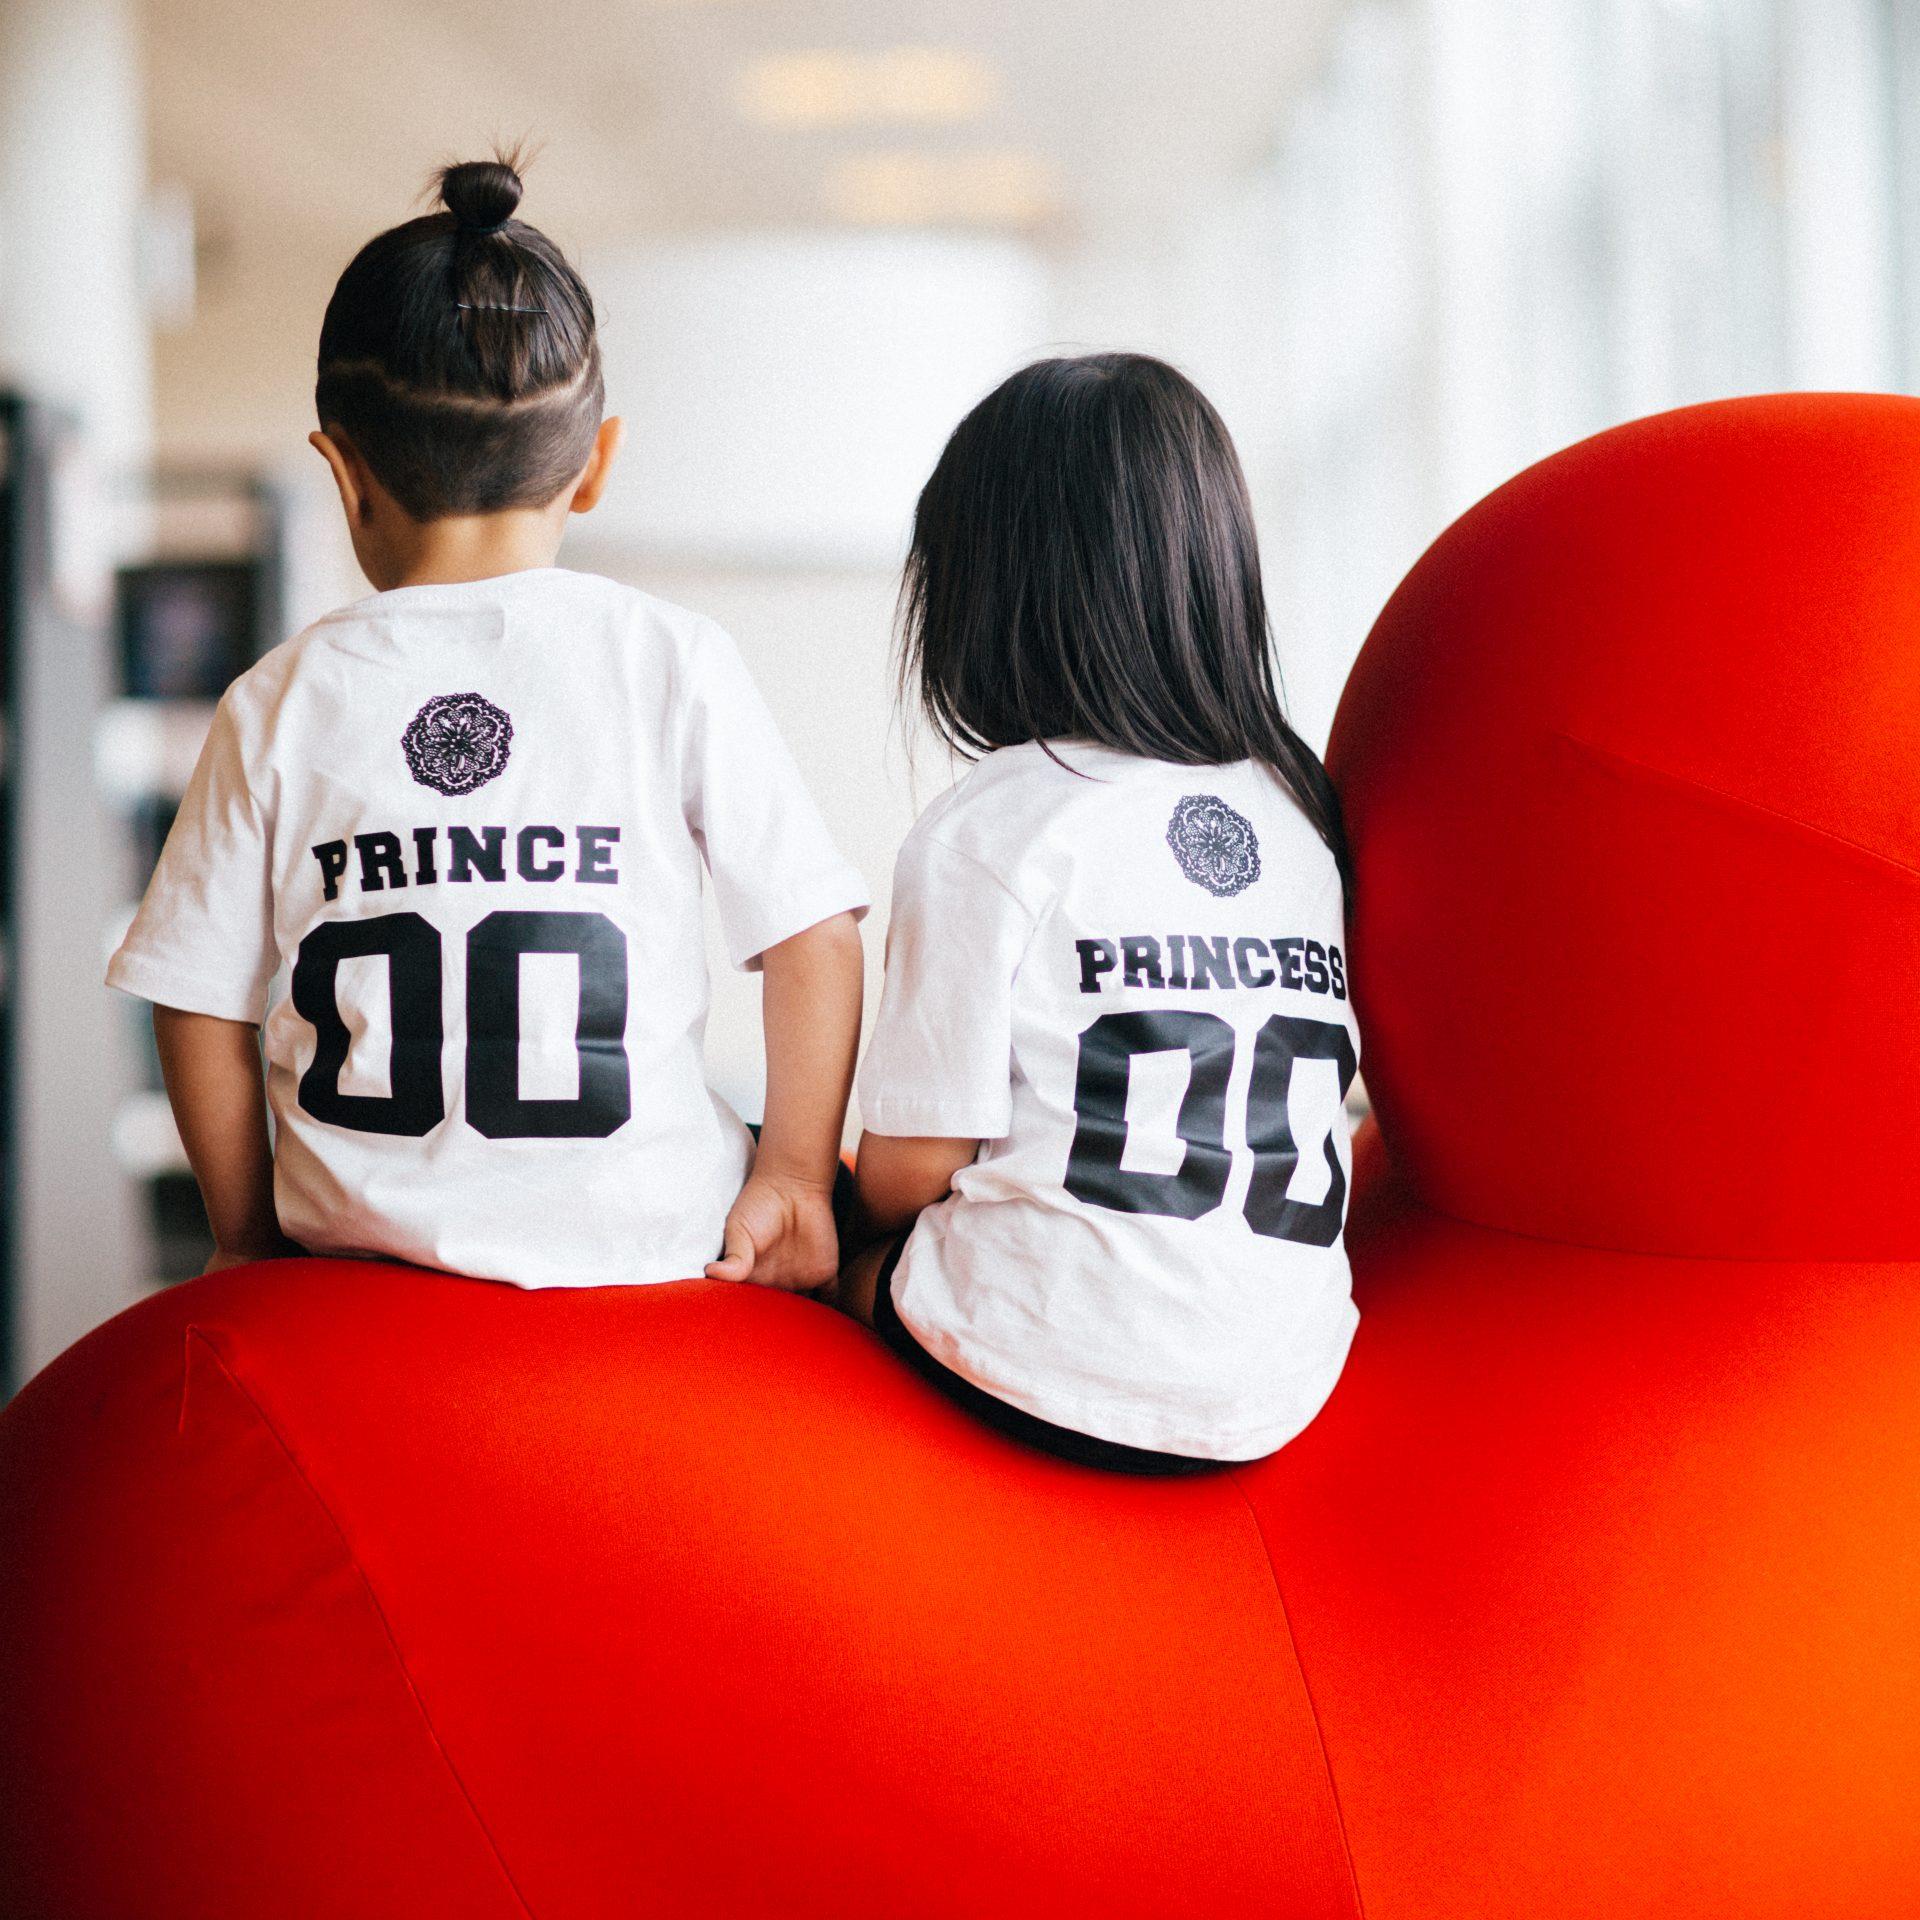 Prince & Princess Kids Couple T-Shirts White